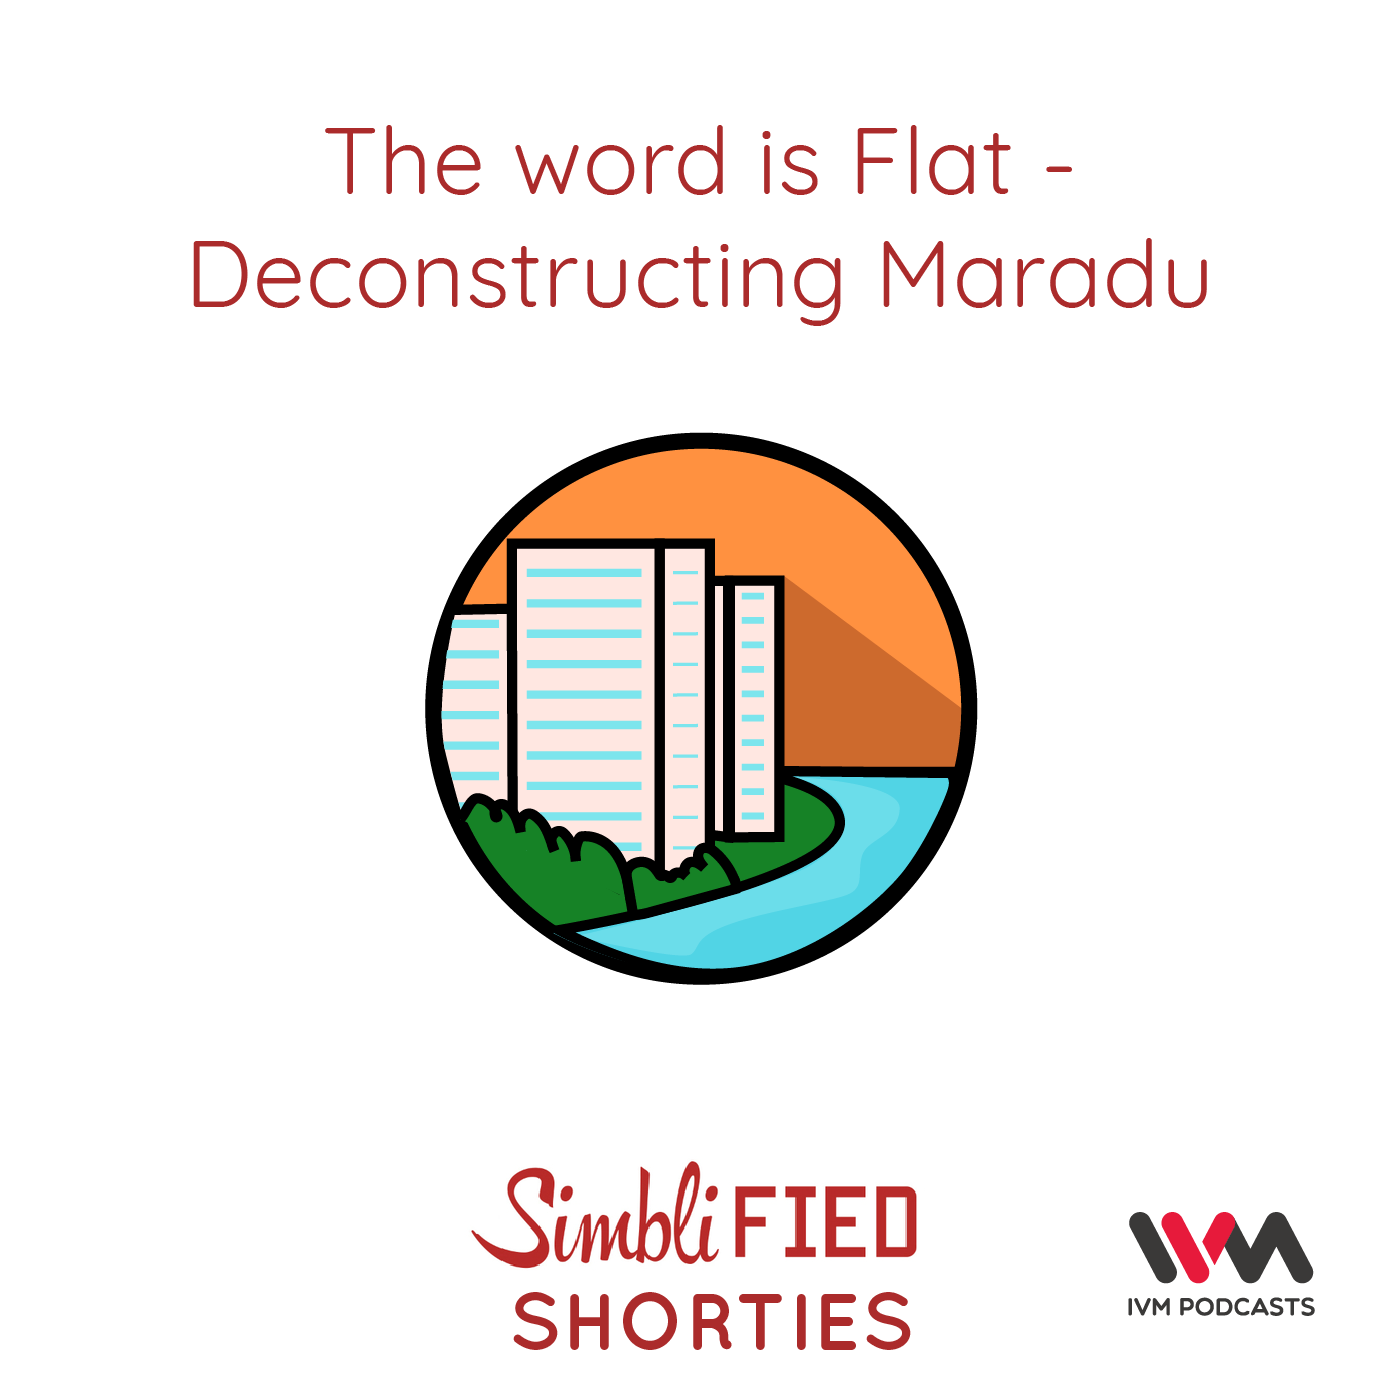 Ep. 167: The word is flat Deconstructing Maradu